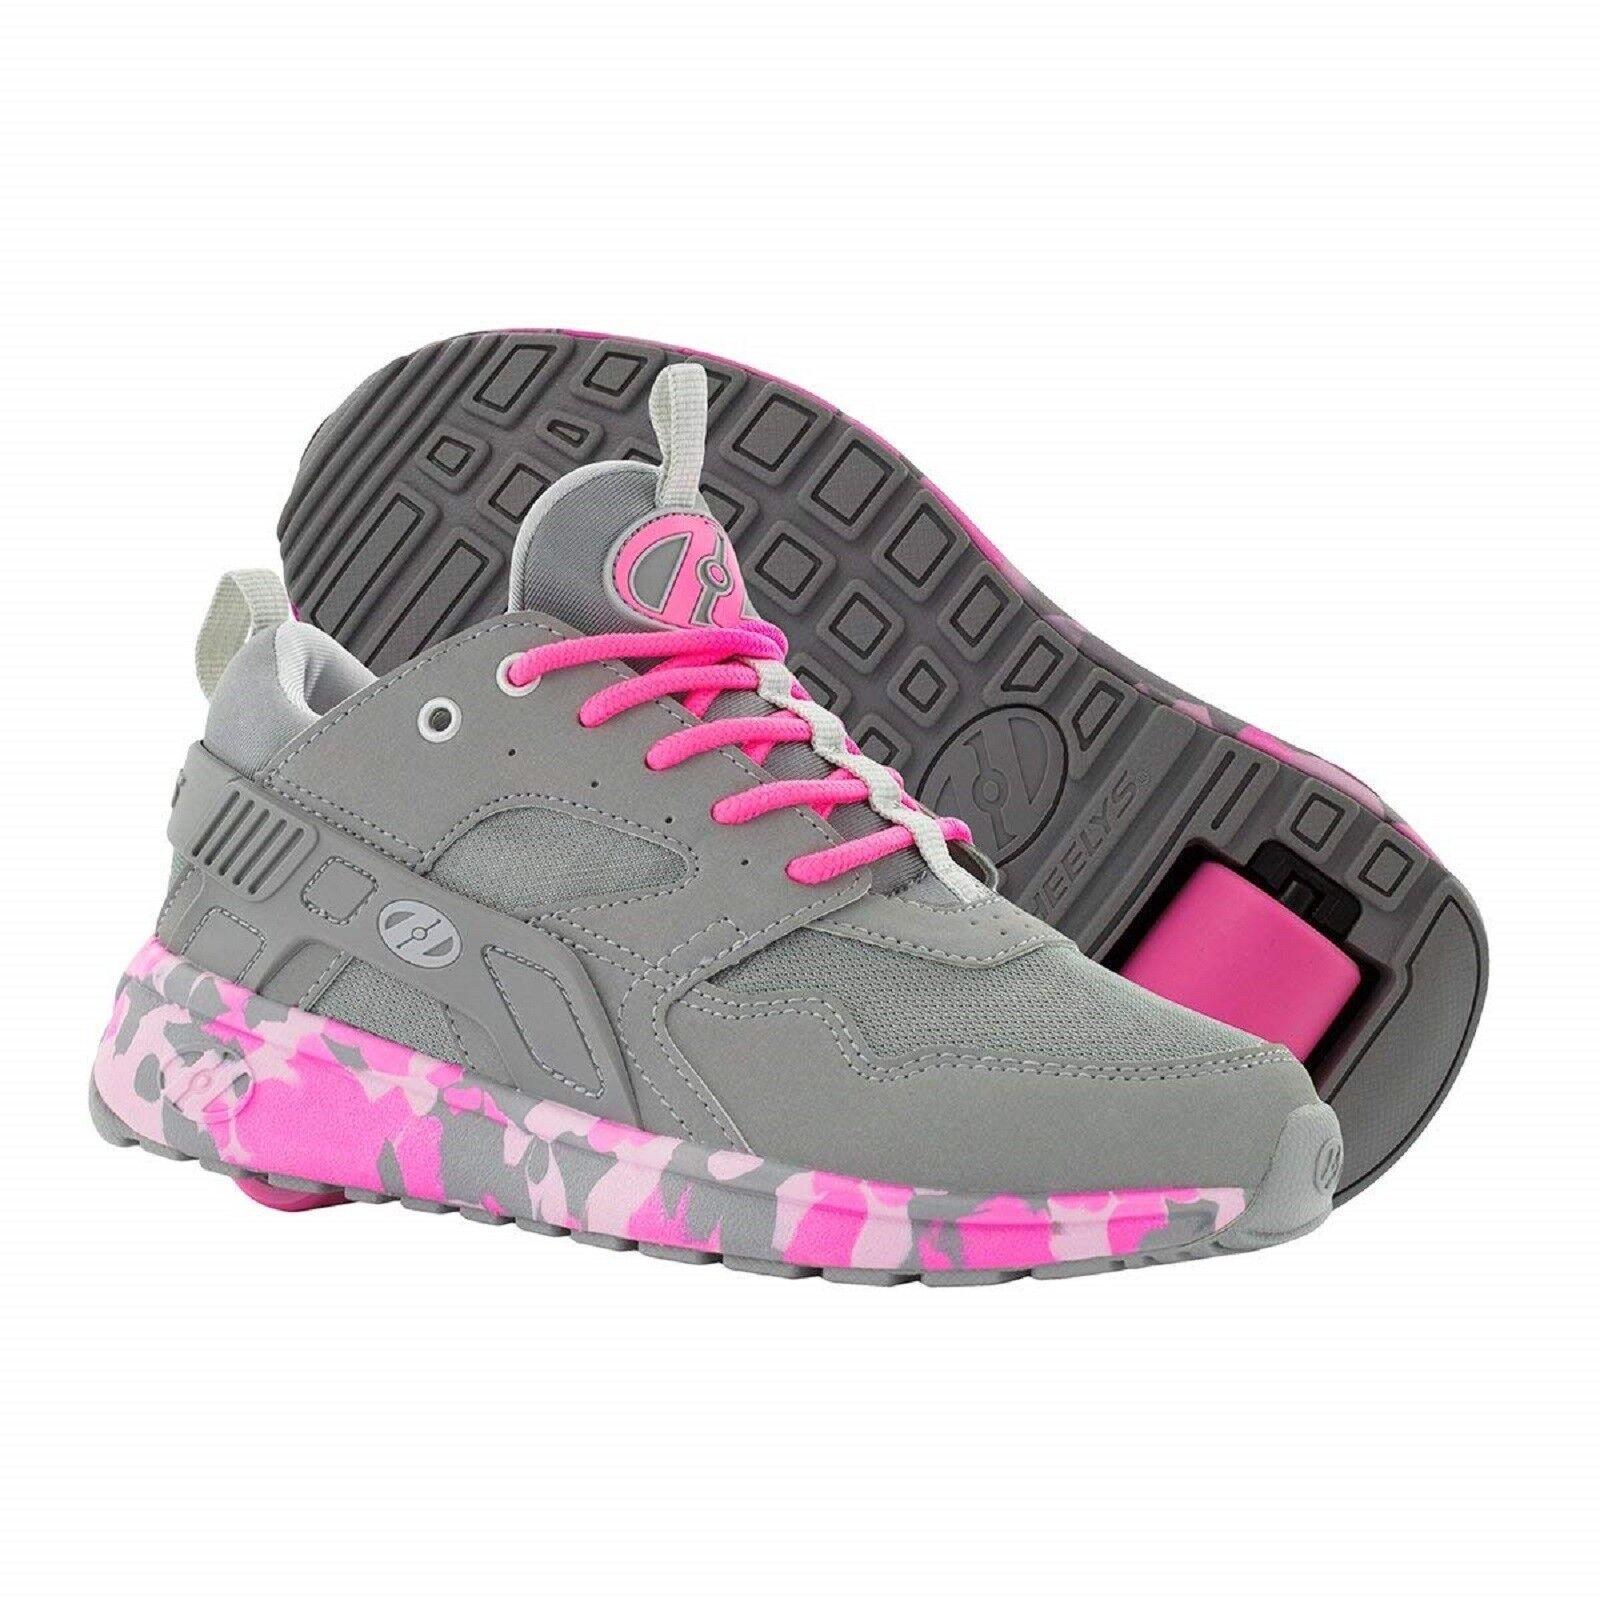 HEELYS FORCE KIDS ROLLER SKATE Schuhe FORCE K Turnschuhe Turnschuhe K grau/Rosa CONFETTI HE100098 f6358f